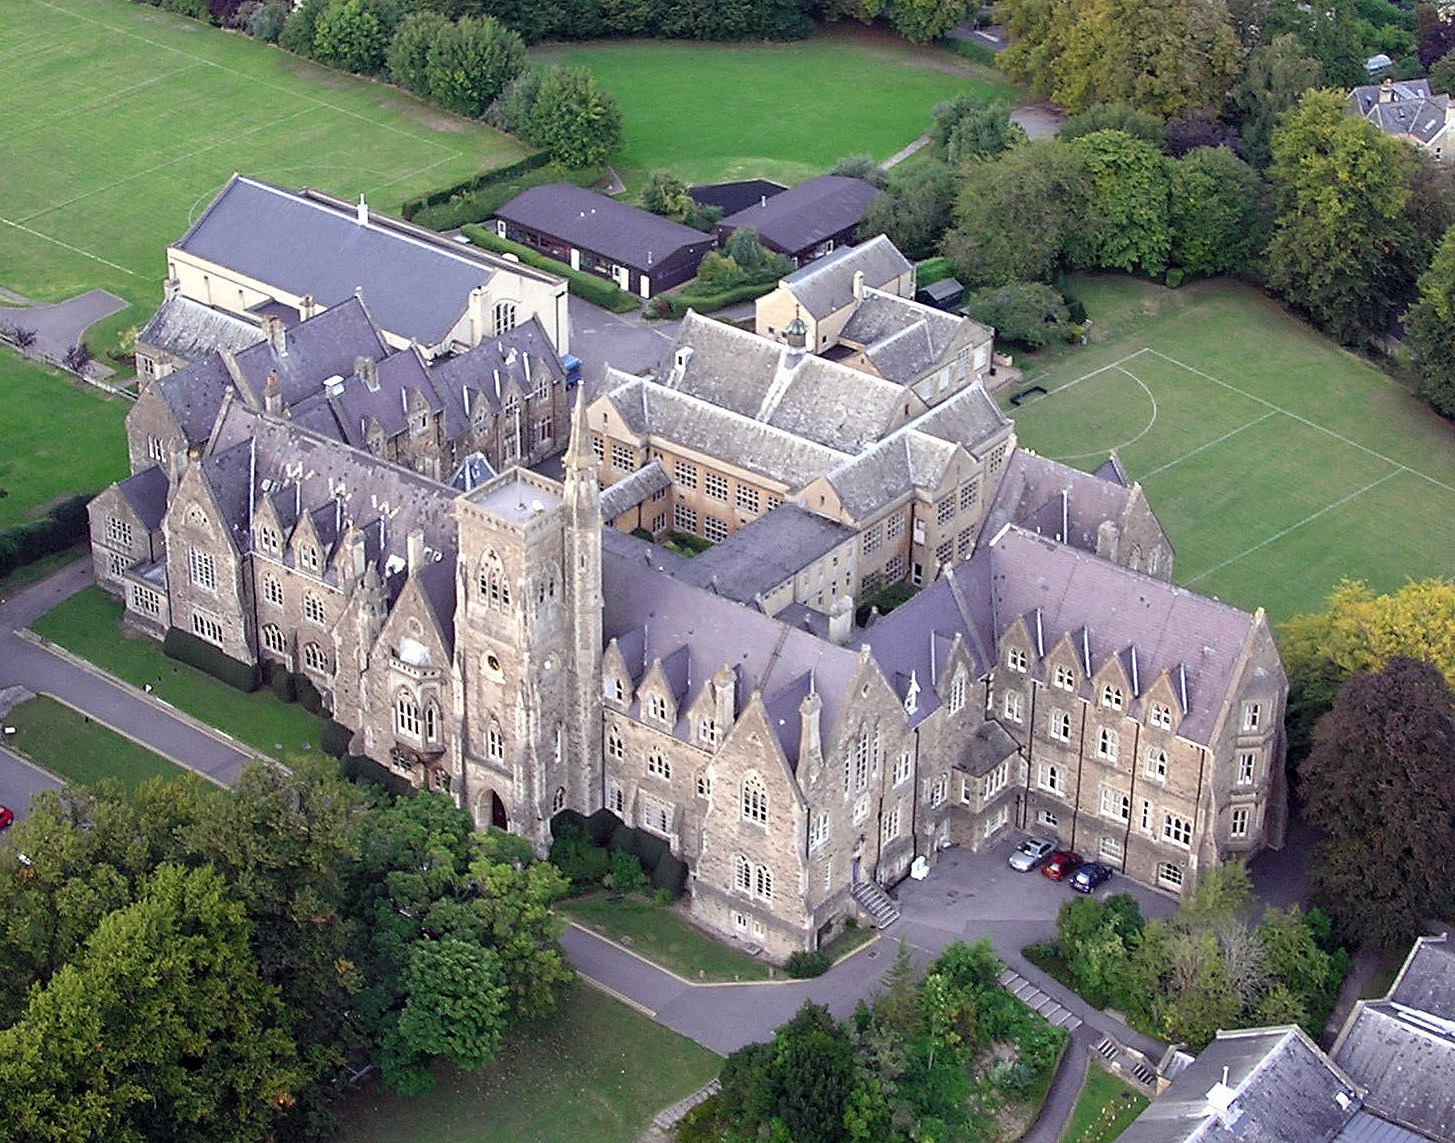 File:The Royal High School Bath England arp.jpg - Wikimedia Commons